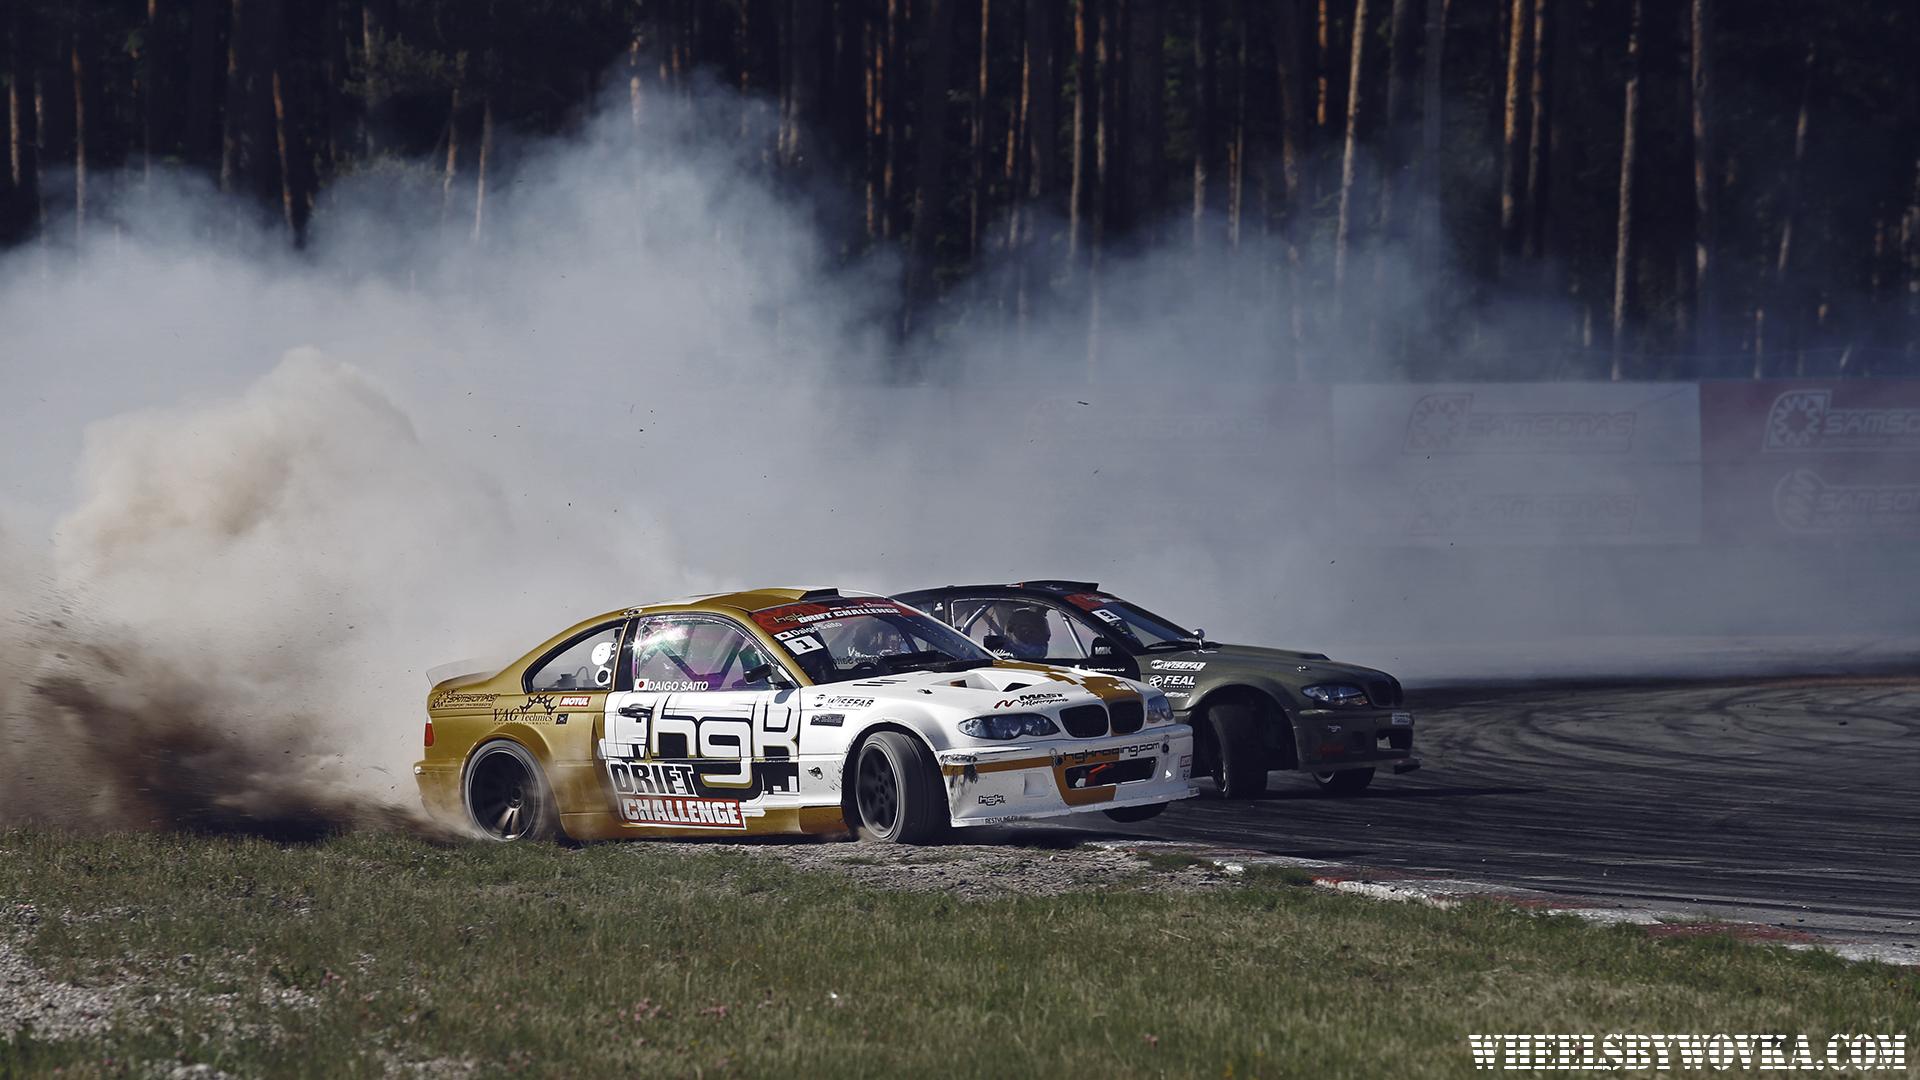 hgk-drift-challenge-2017-by-wheelsbywovka-27